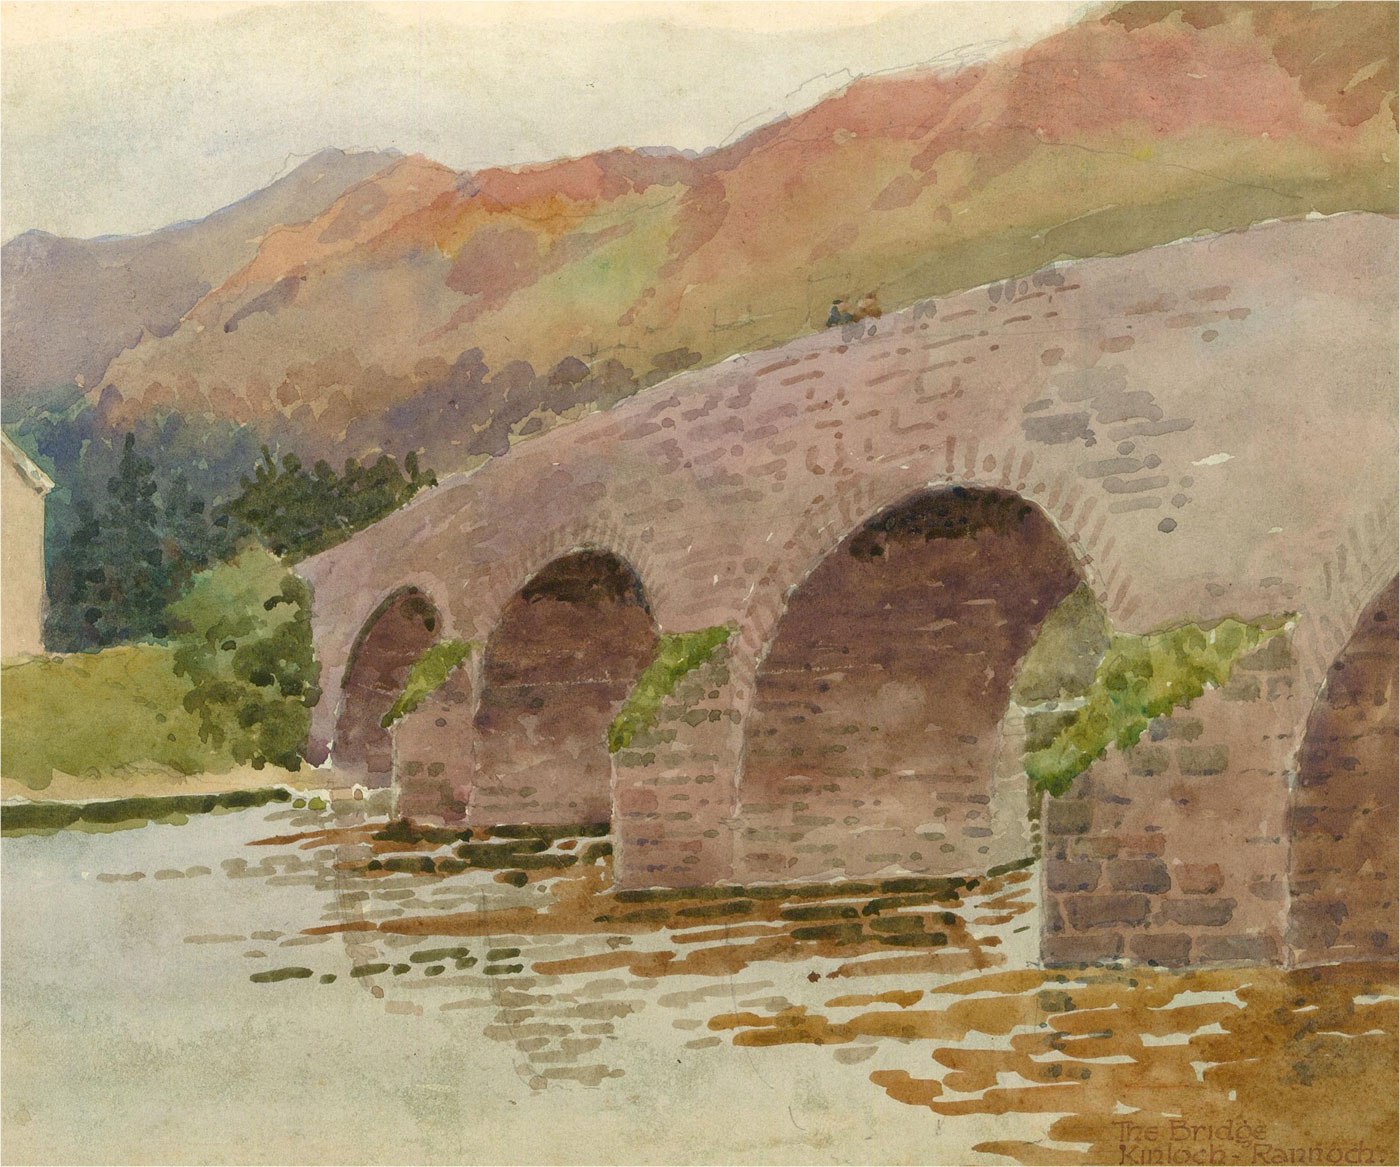 Raymond Turner Barker (1872-1945) - 1930 Watercolour, Kinloch Rannoch Bridge